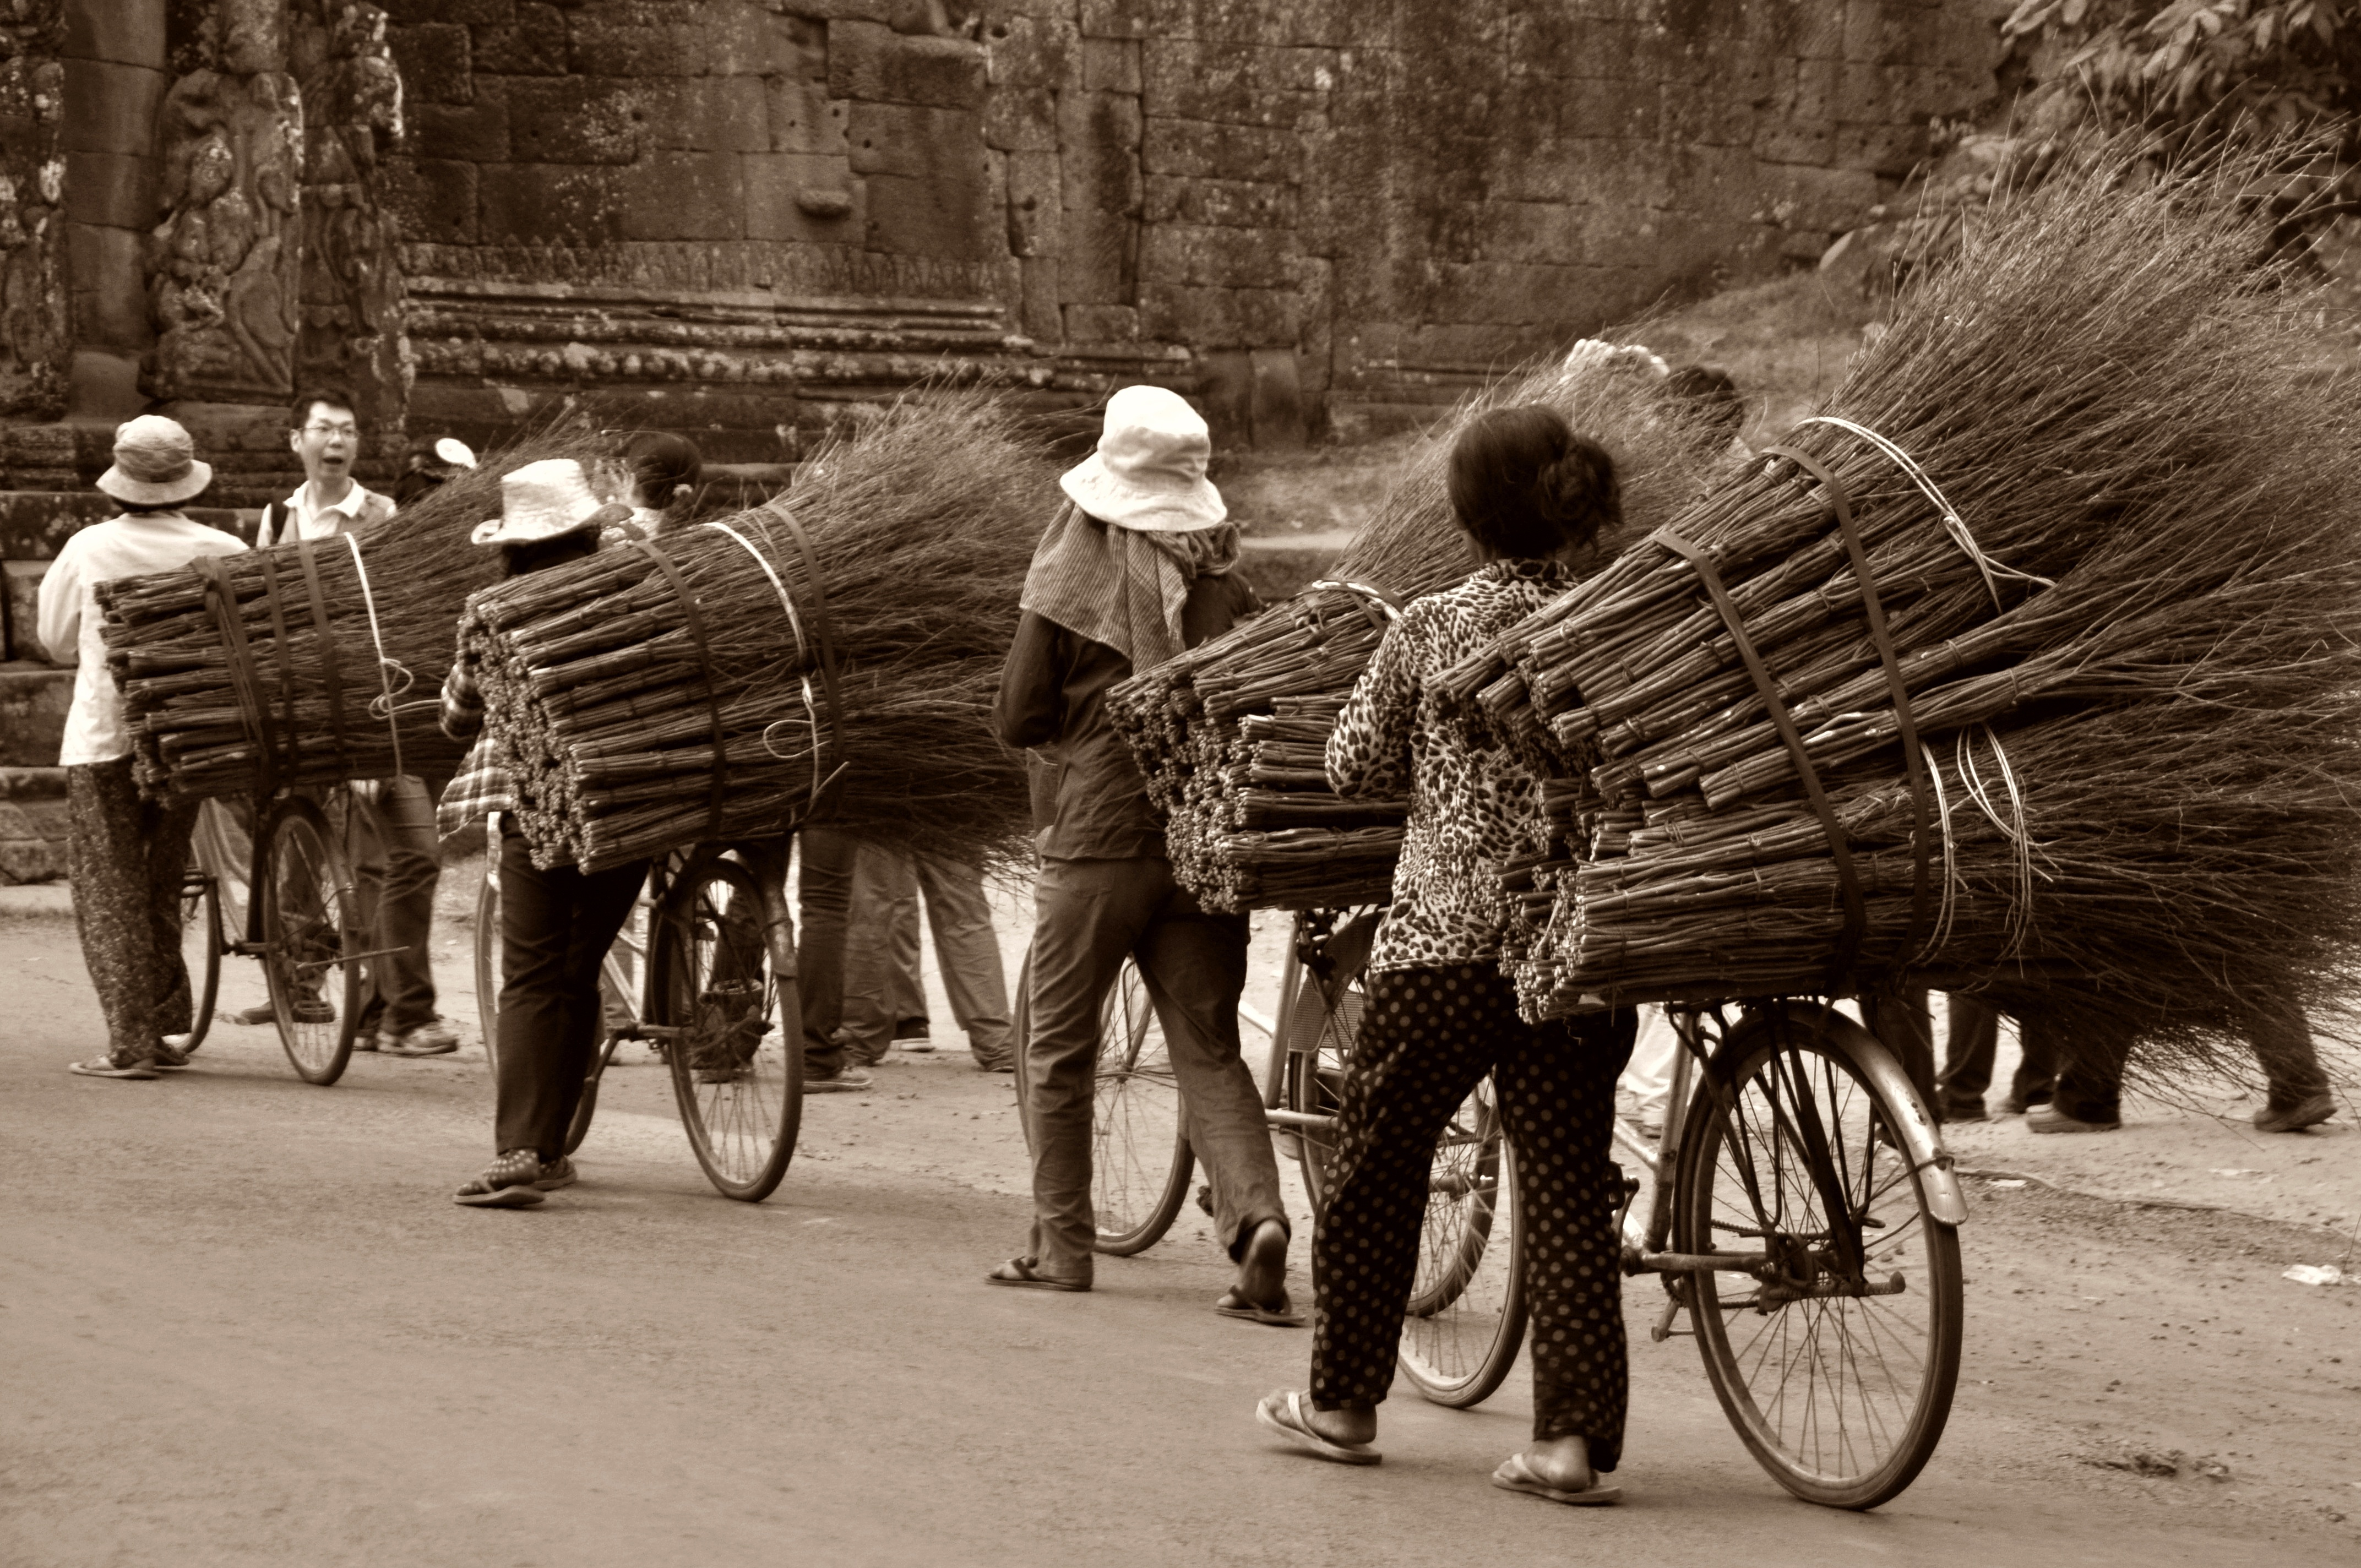 cambodia-angkor-temple-historically-161114